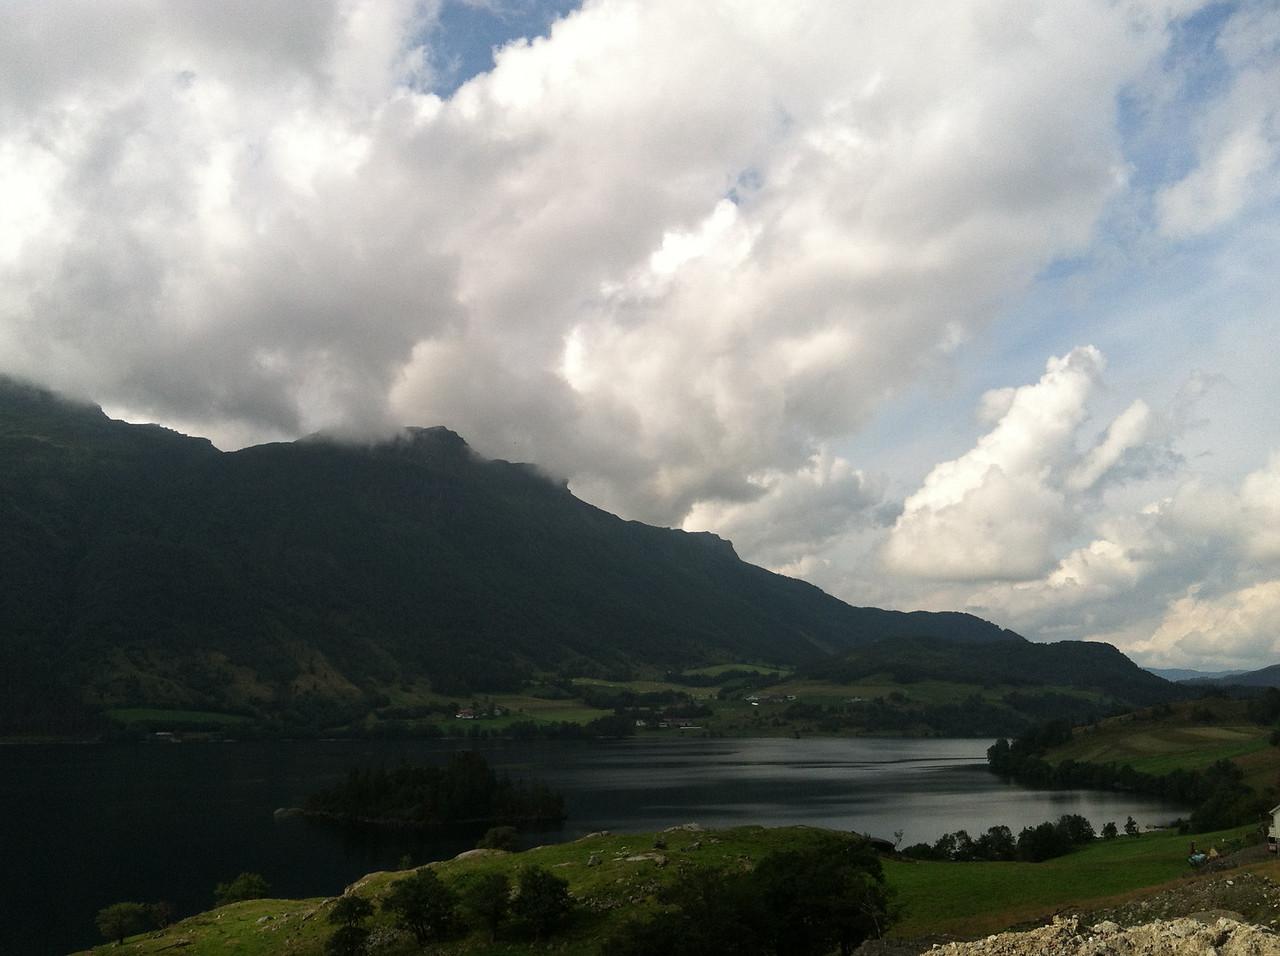 Views of Sande Farm from E134